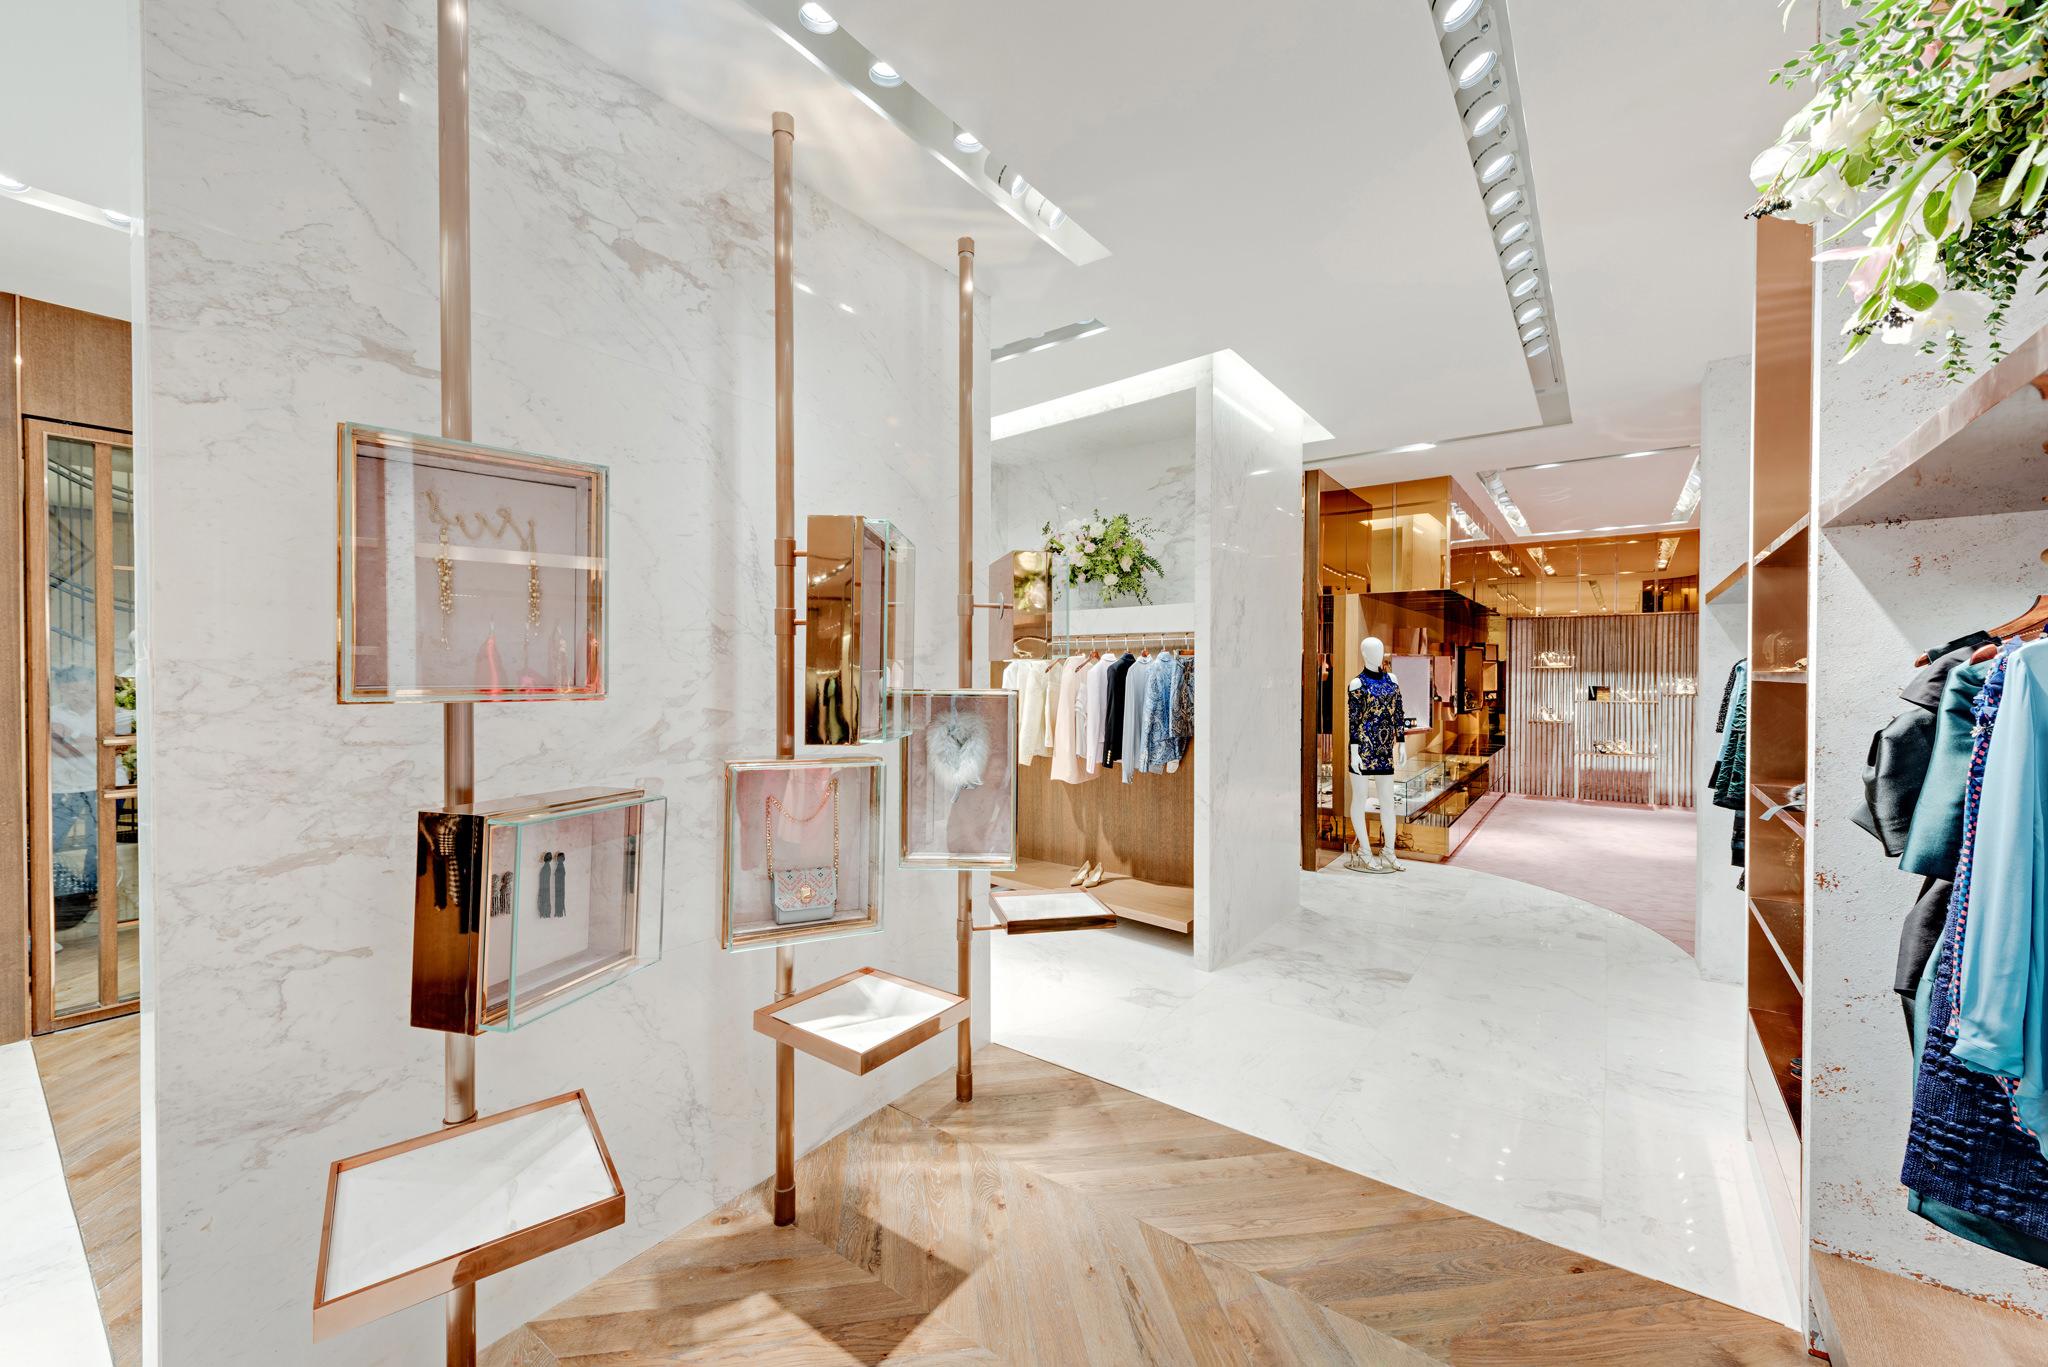 20161224 - Jacqueline - HCM - Commercial - Interior - Store - Retouch 0008.jpg